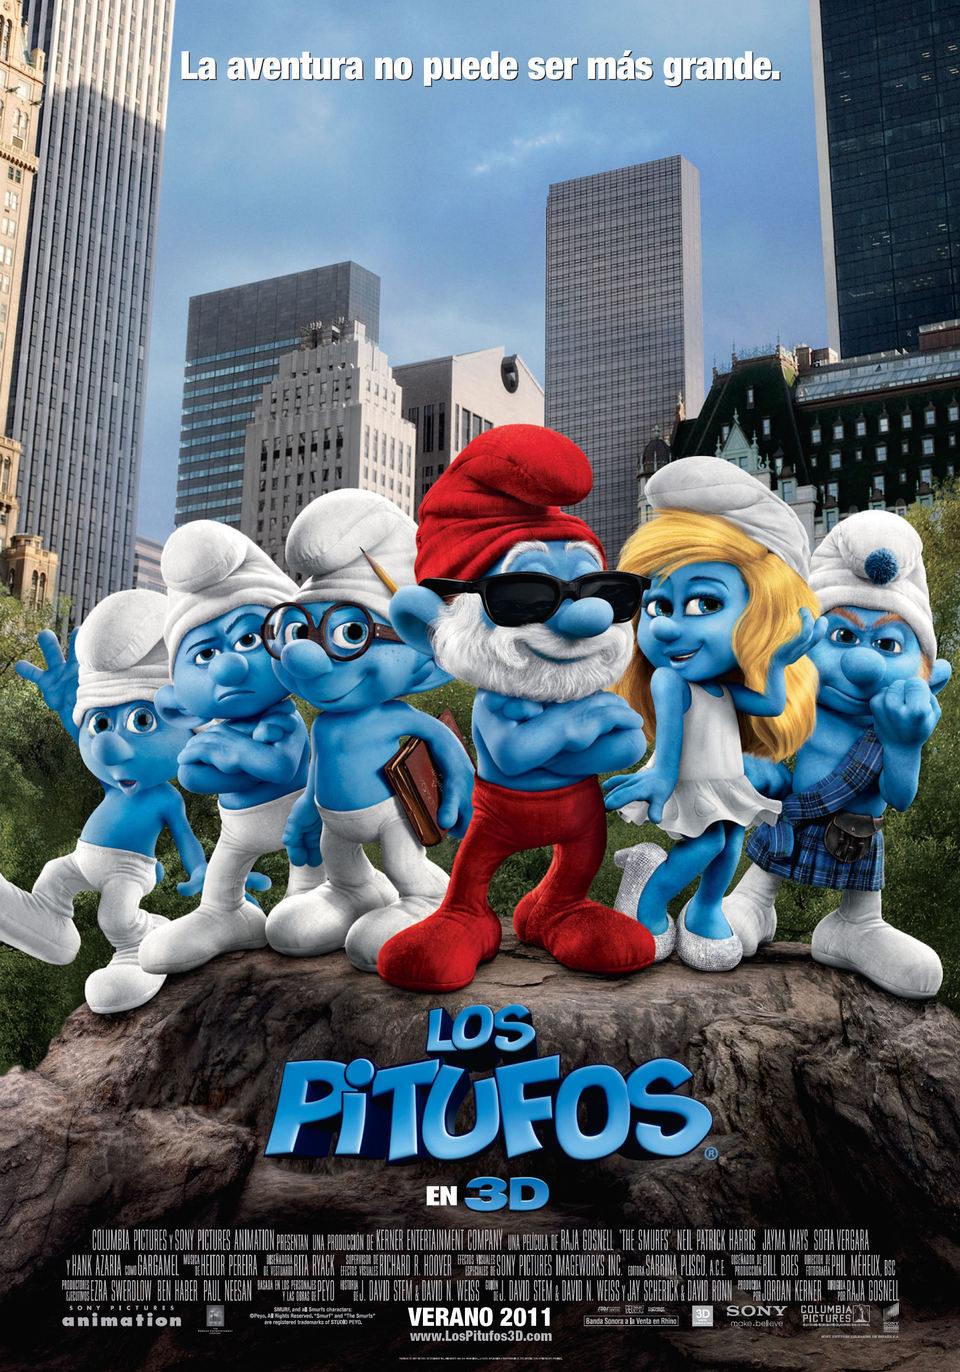 España poster for The Smurfs